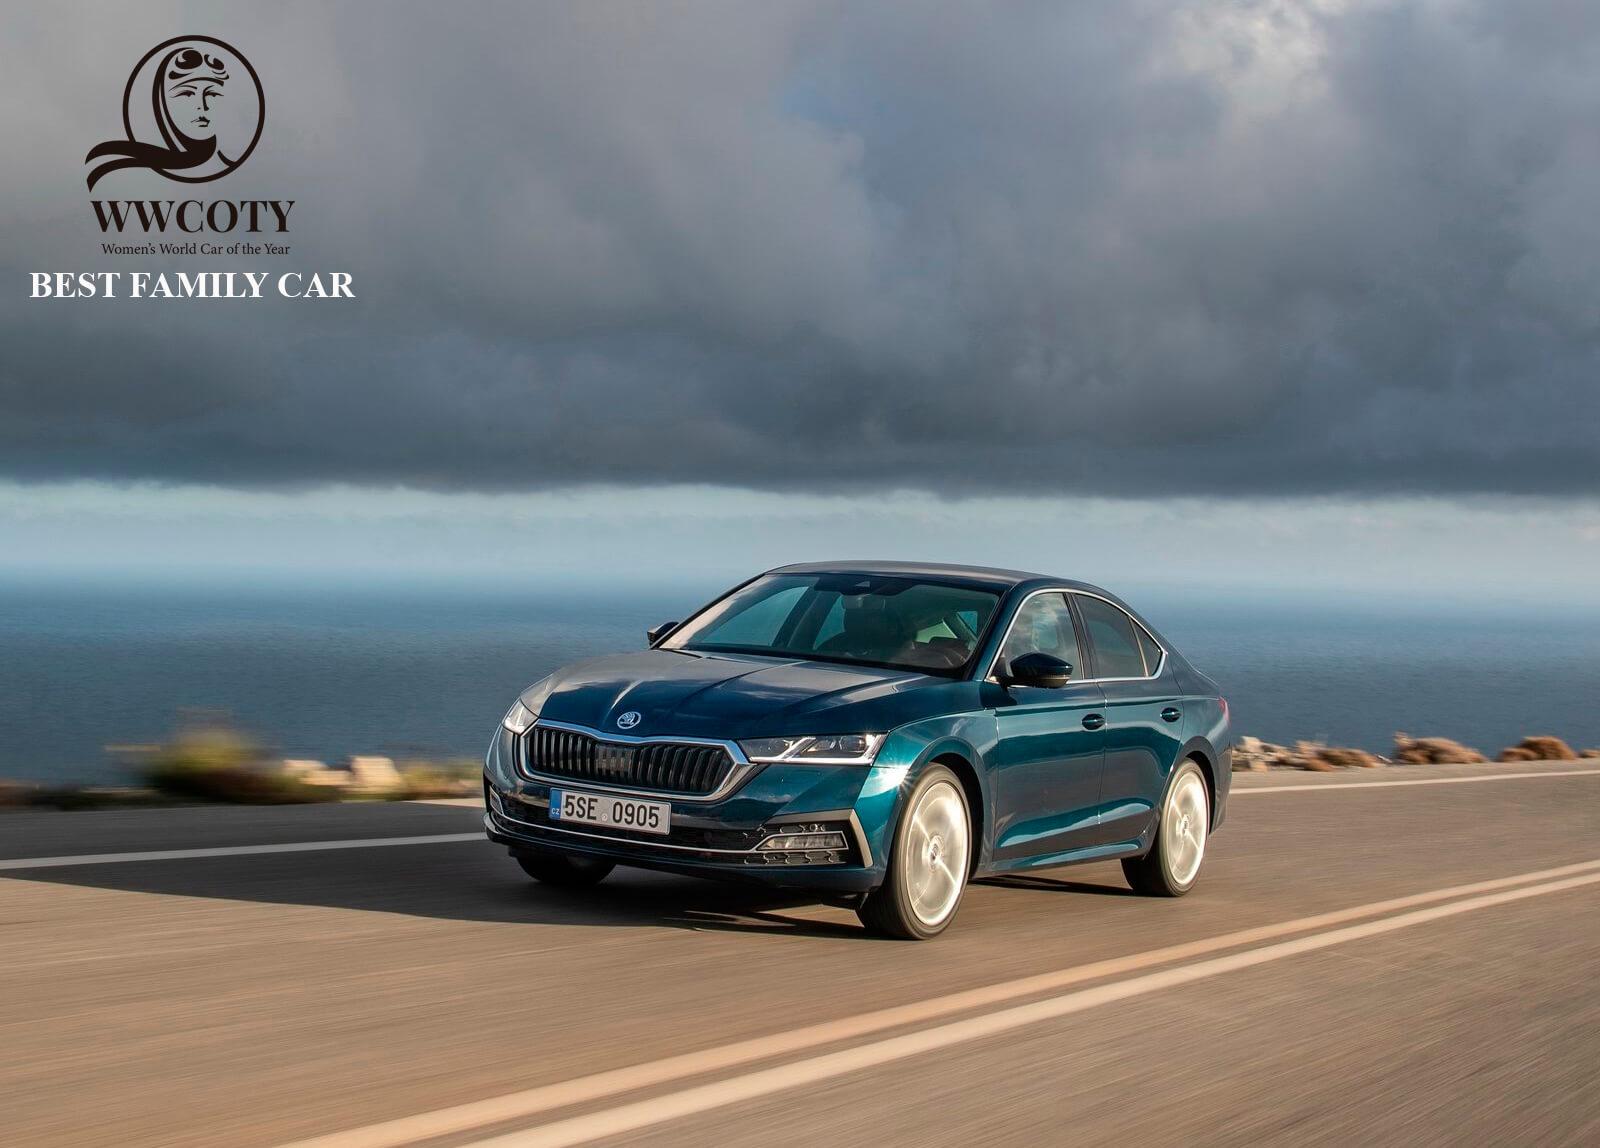 SKODA OCTAVIA - BEST FAMILY CAR - WOMENS WORLD CAR OF THE YEAR 2020